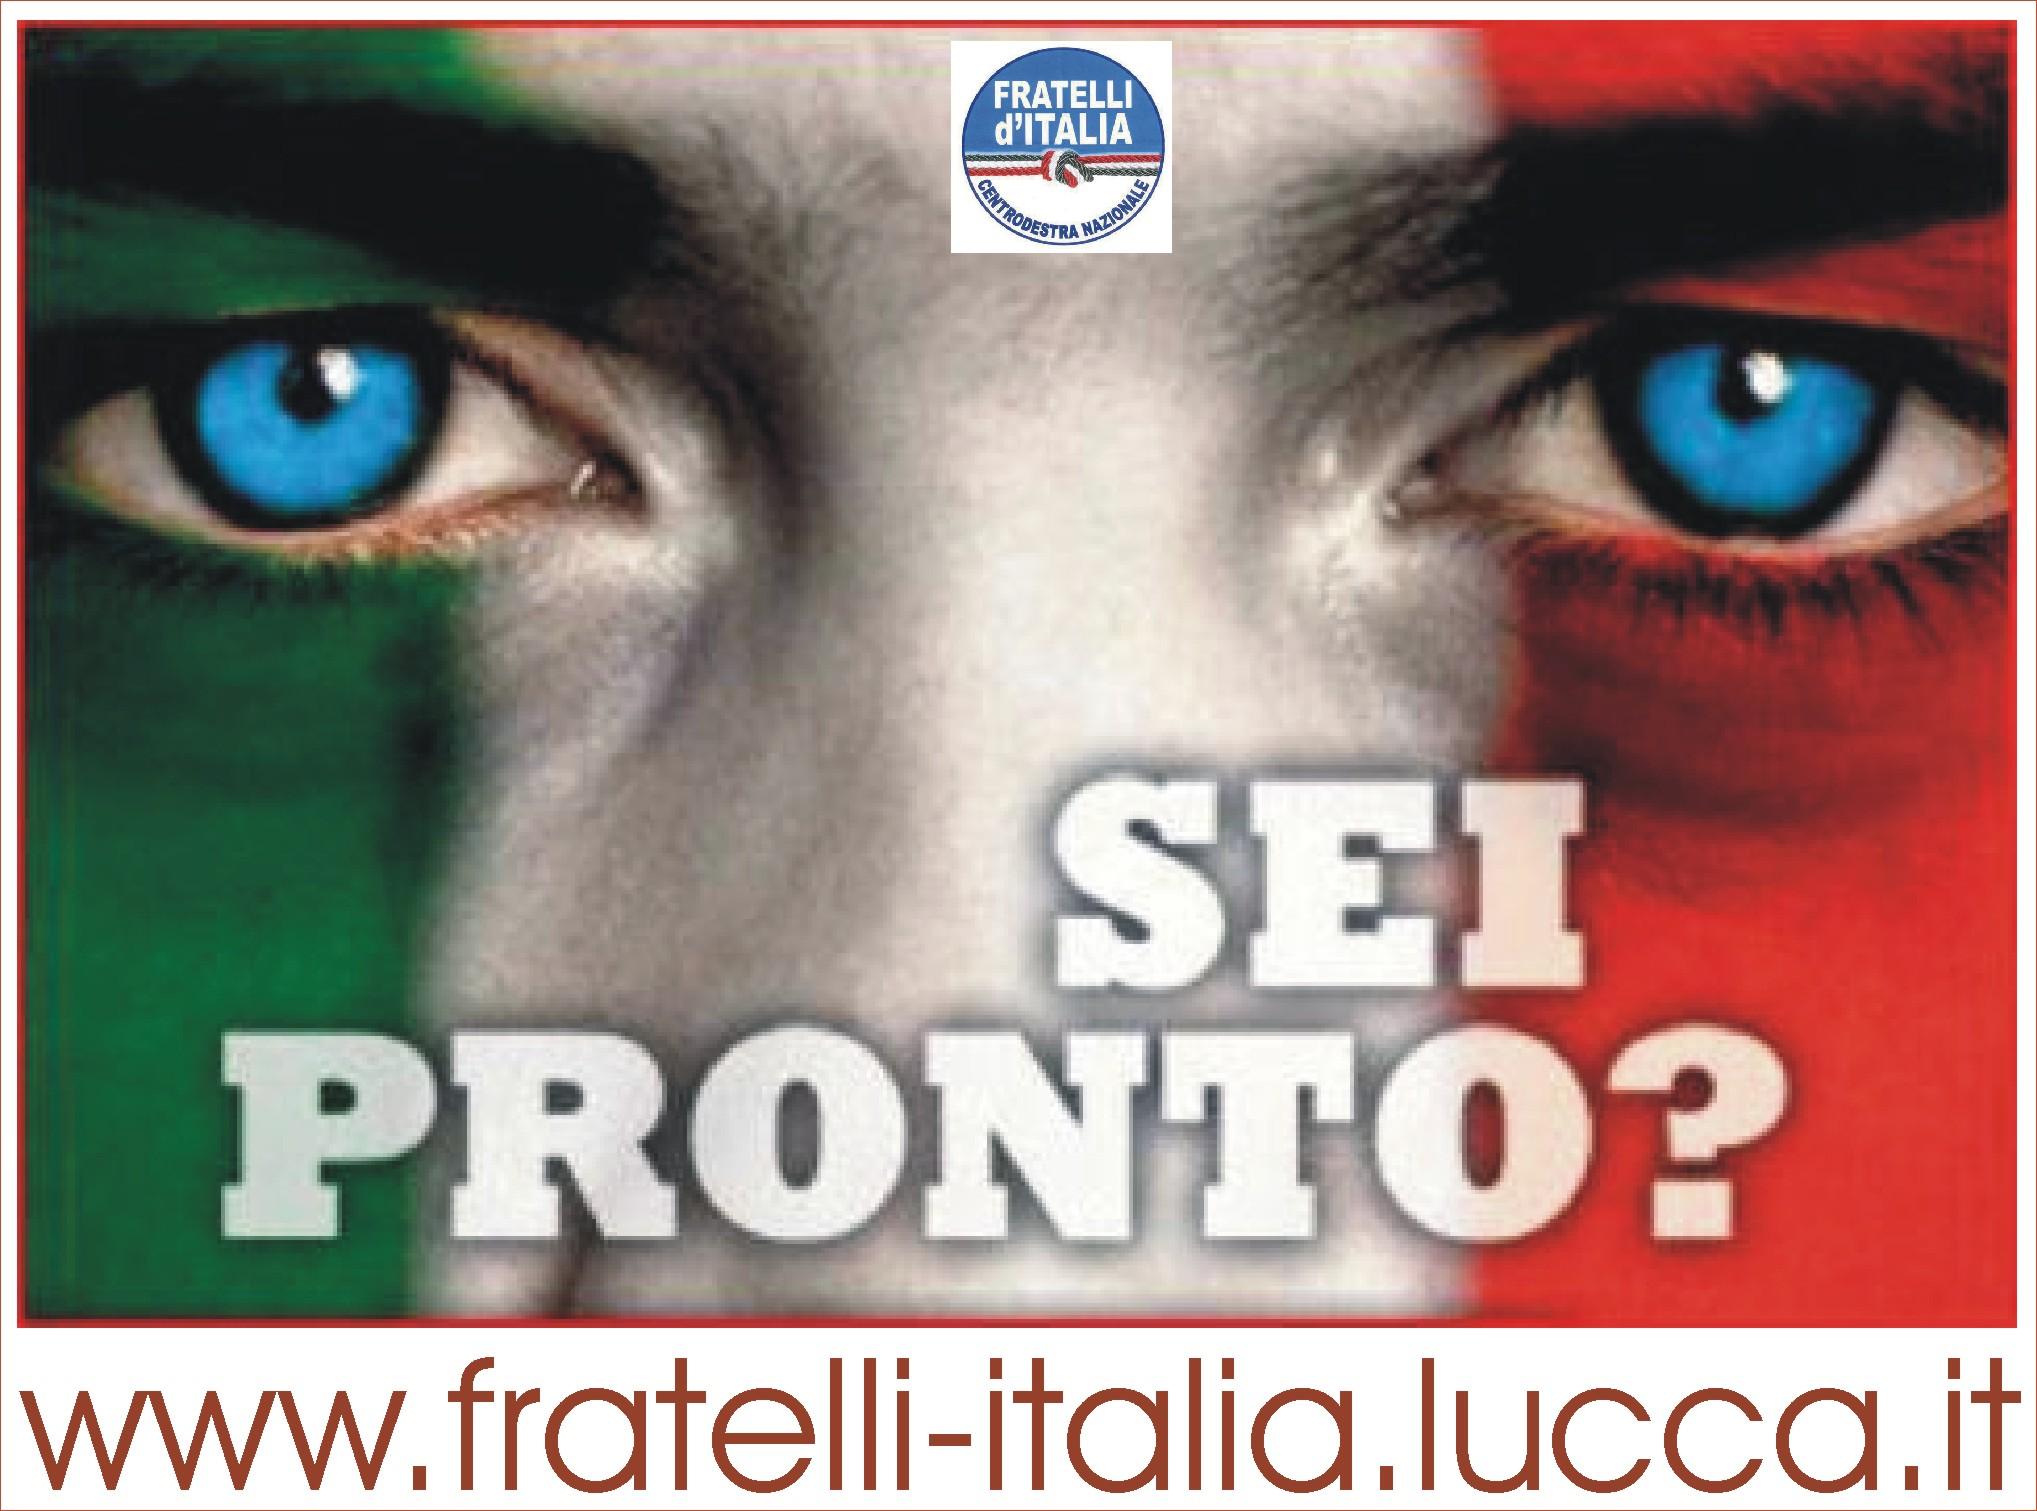 sei pronto fratelli d'italia